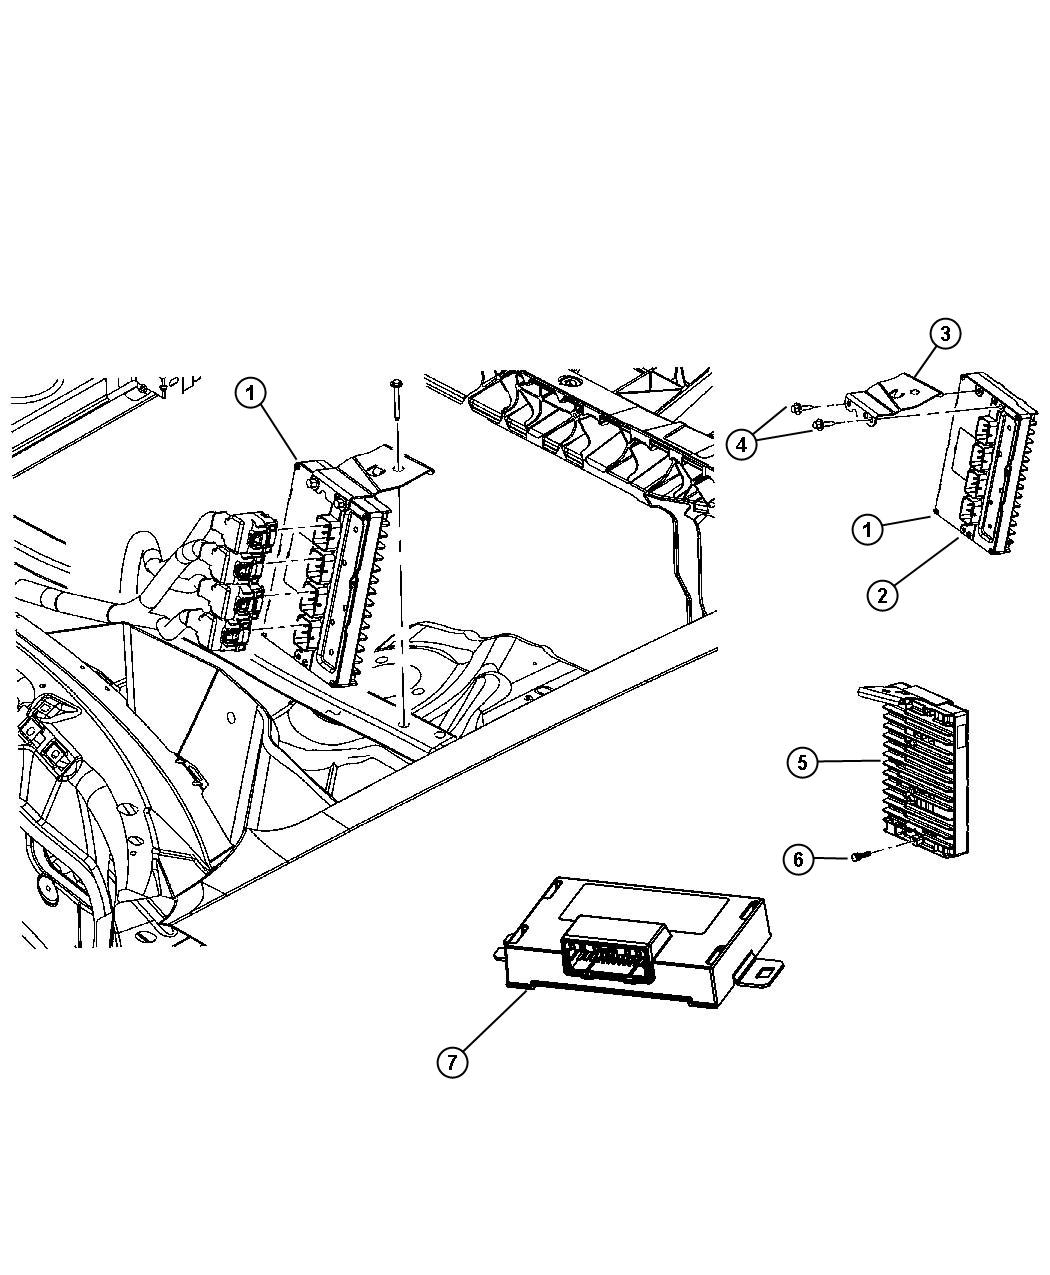 Dodge Charger Module. Powertrain control. Generic